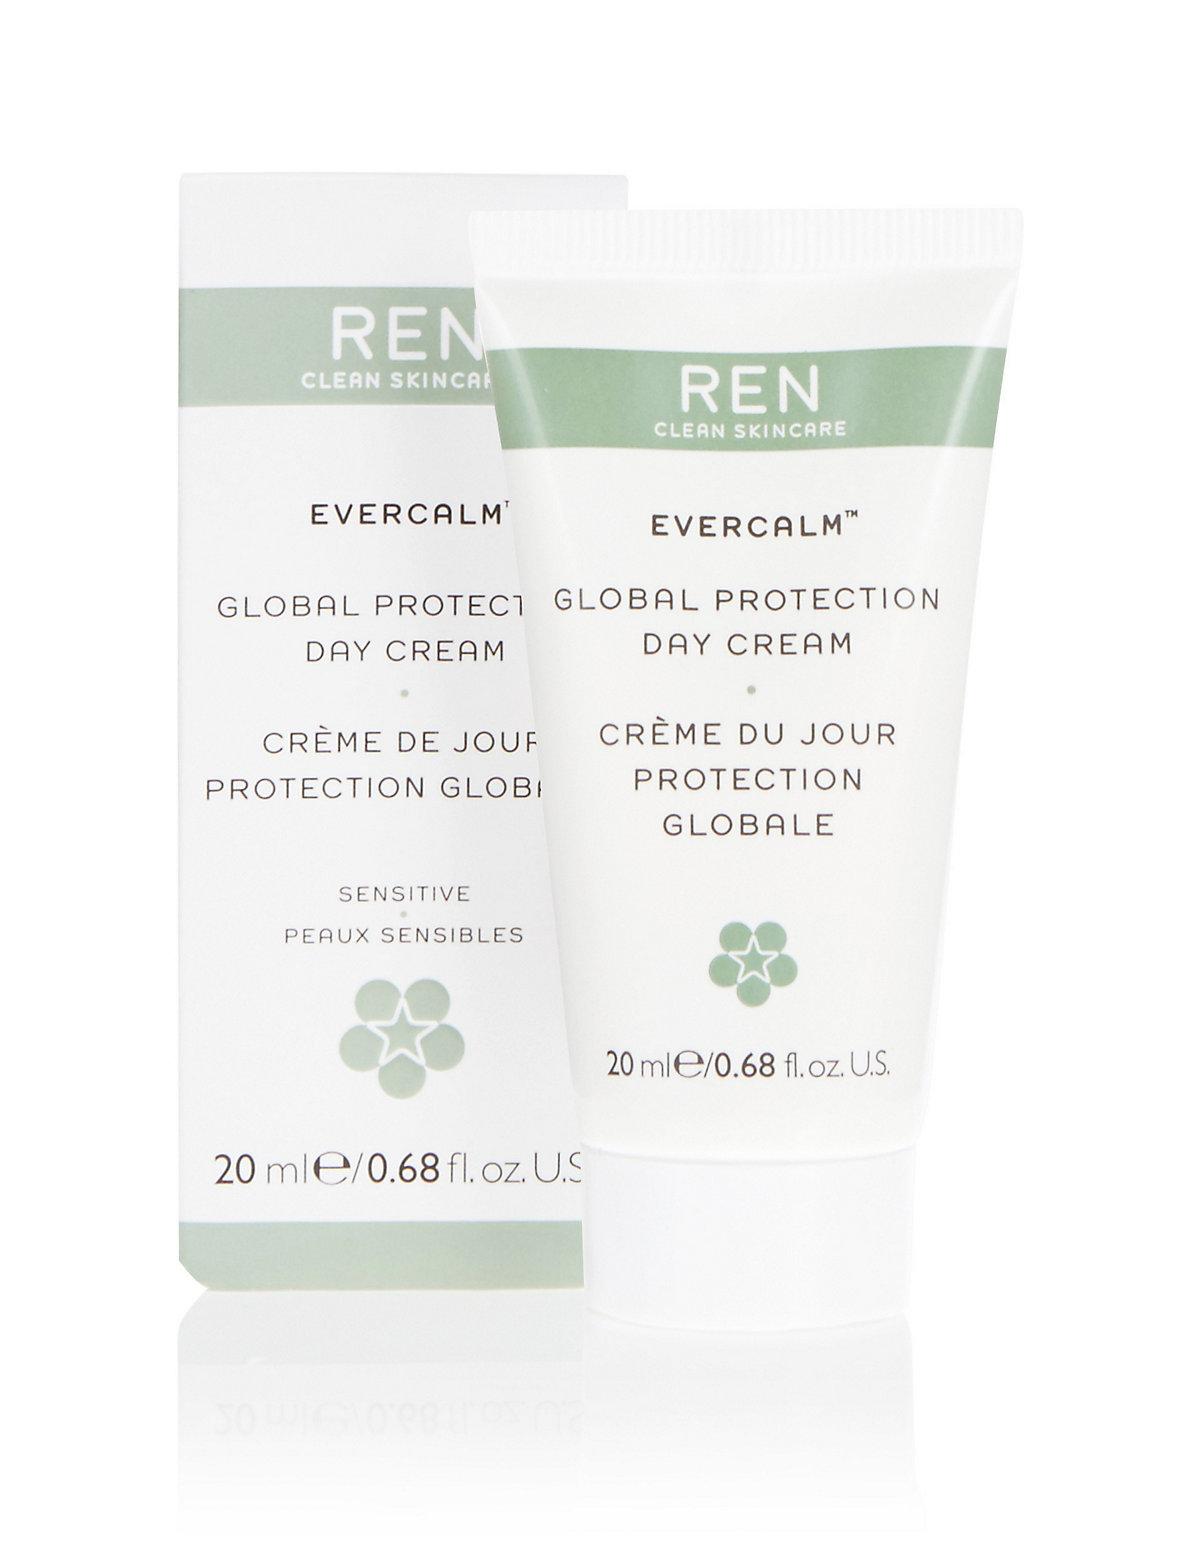 REN Evercalm Day Cream 20ml